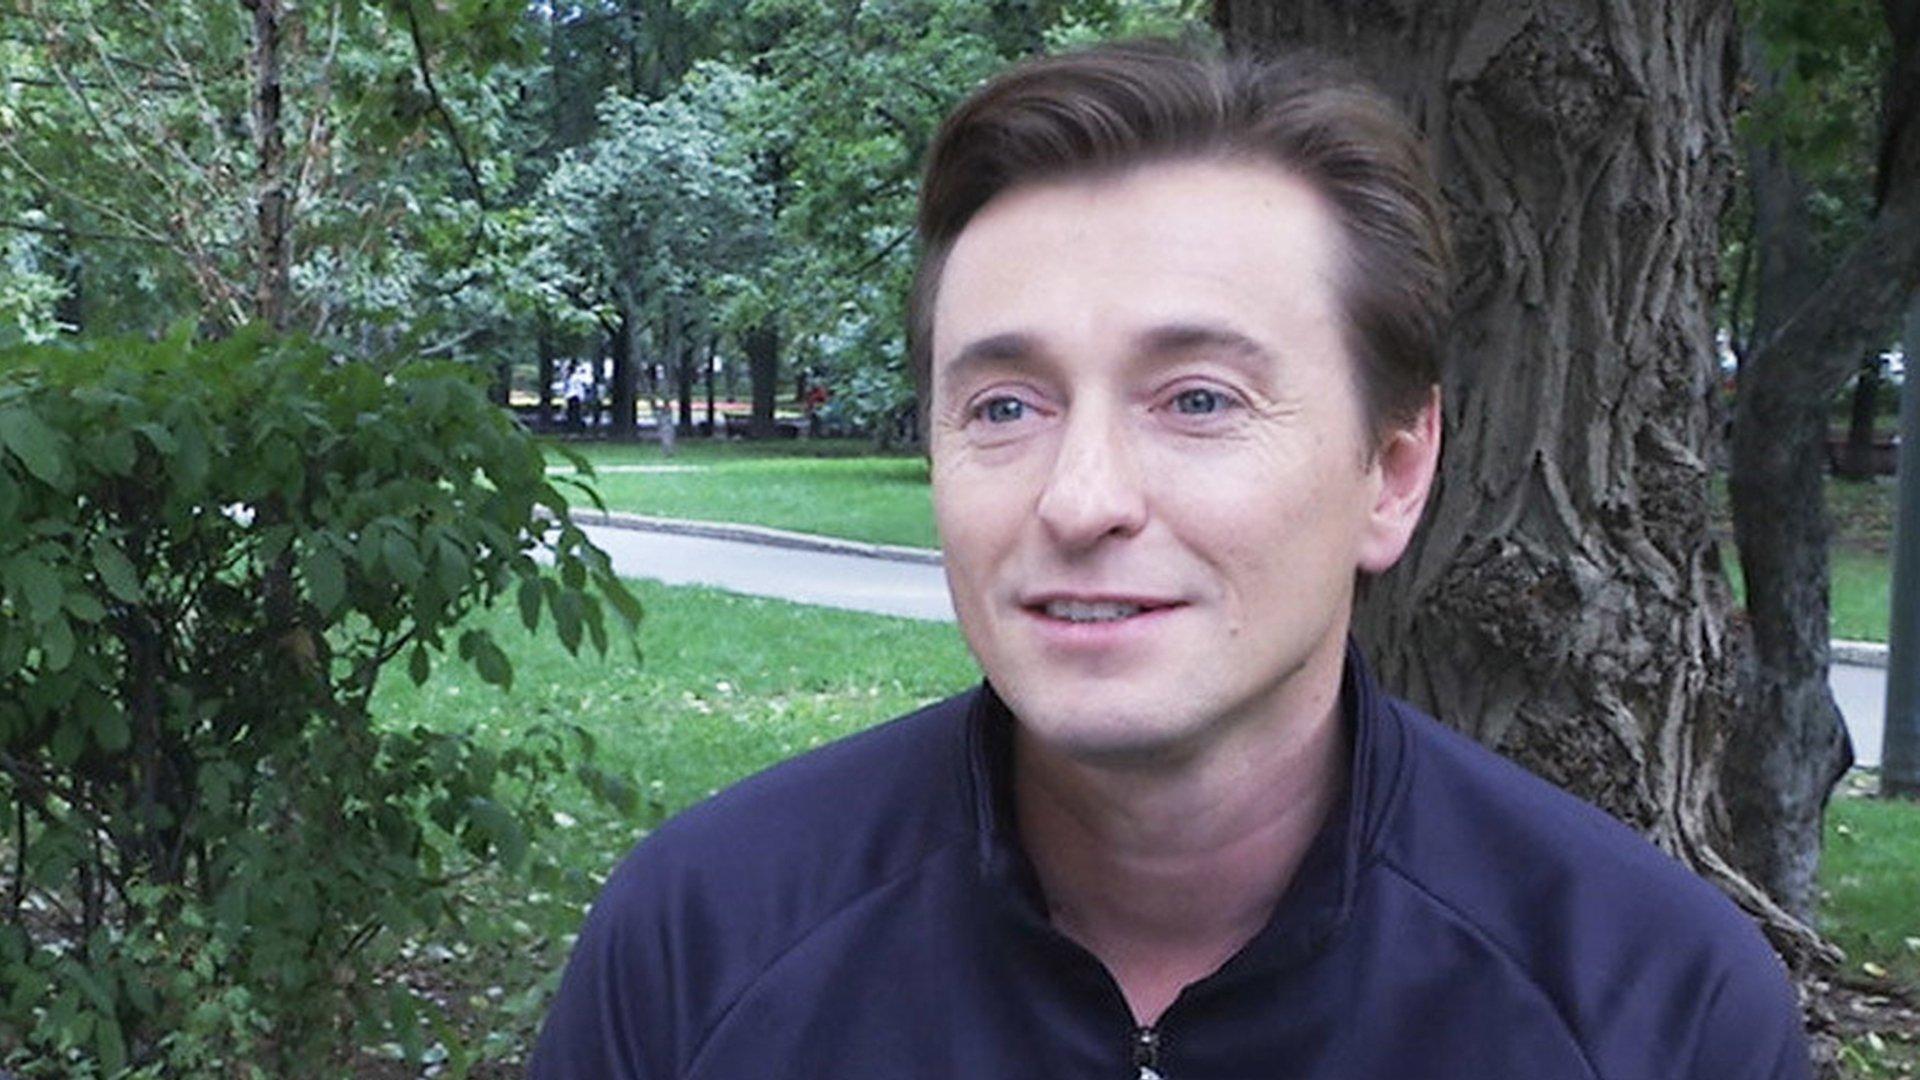 «Сергей Безруков. Иснова счистого листа»